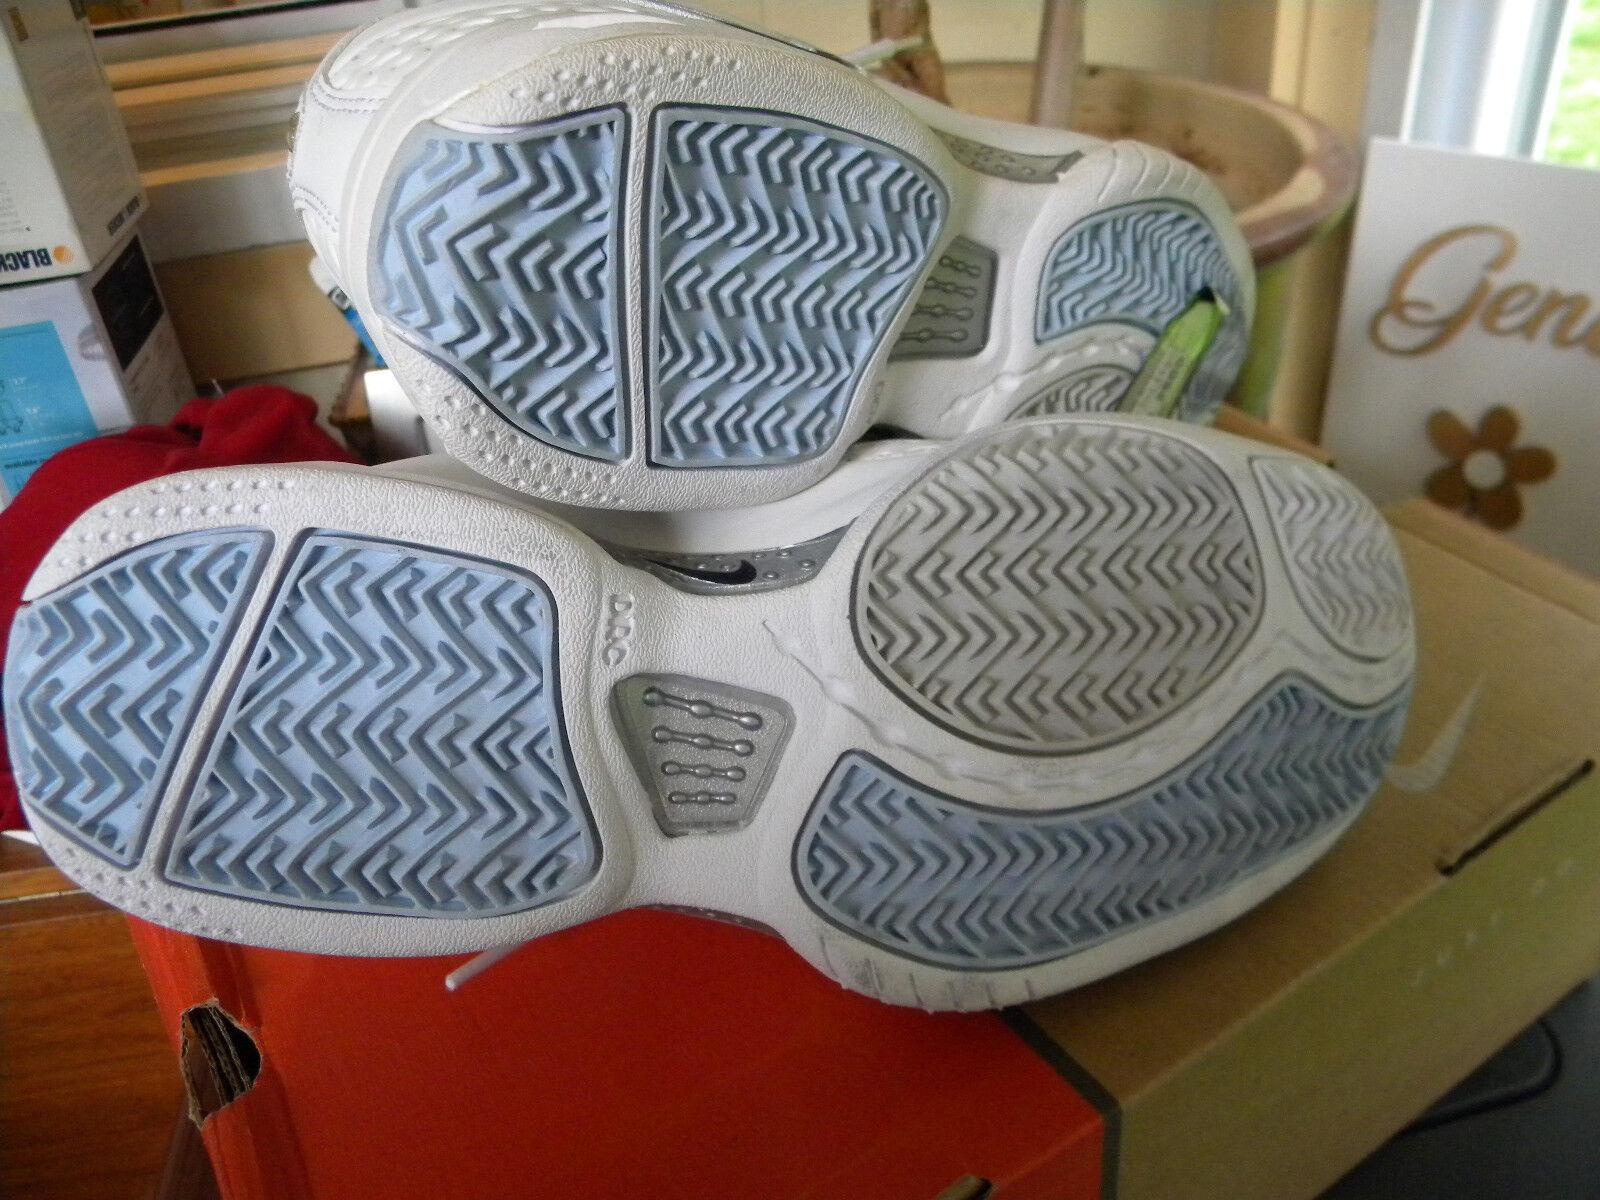 Nike air blue zoom vomero 13 donne 922909-009 grey blue air rosa scarpe taglia 9 3acb0e